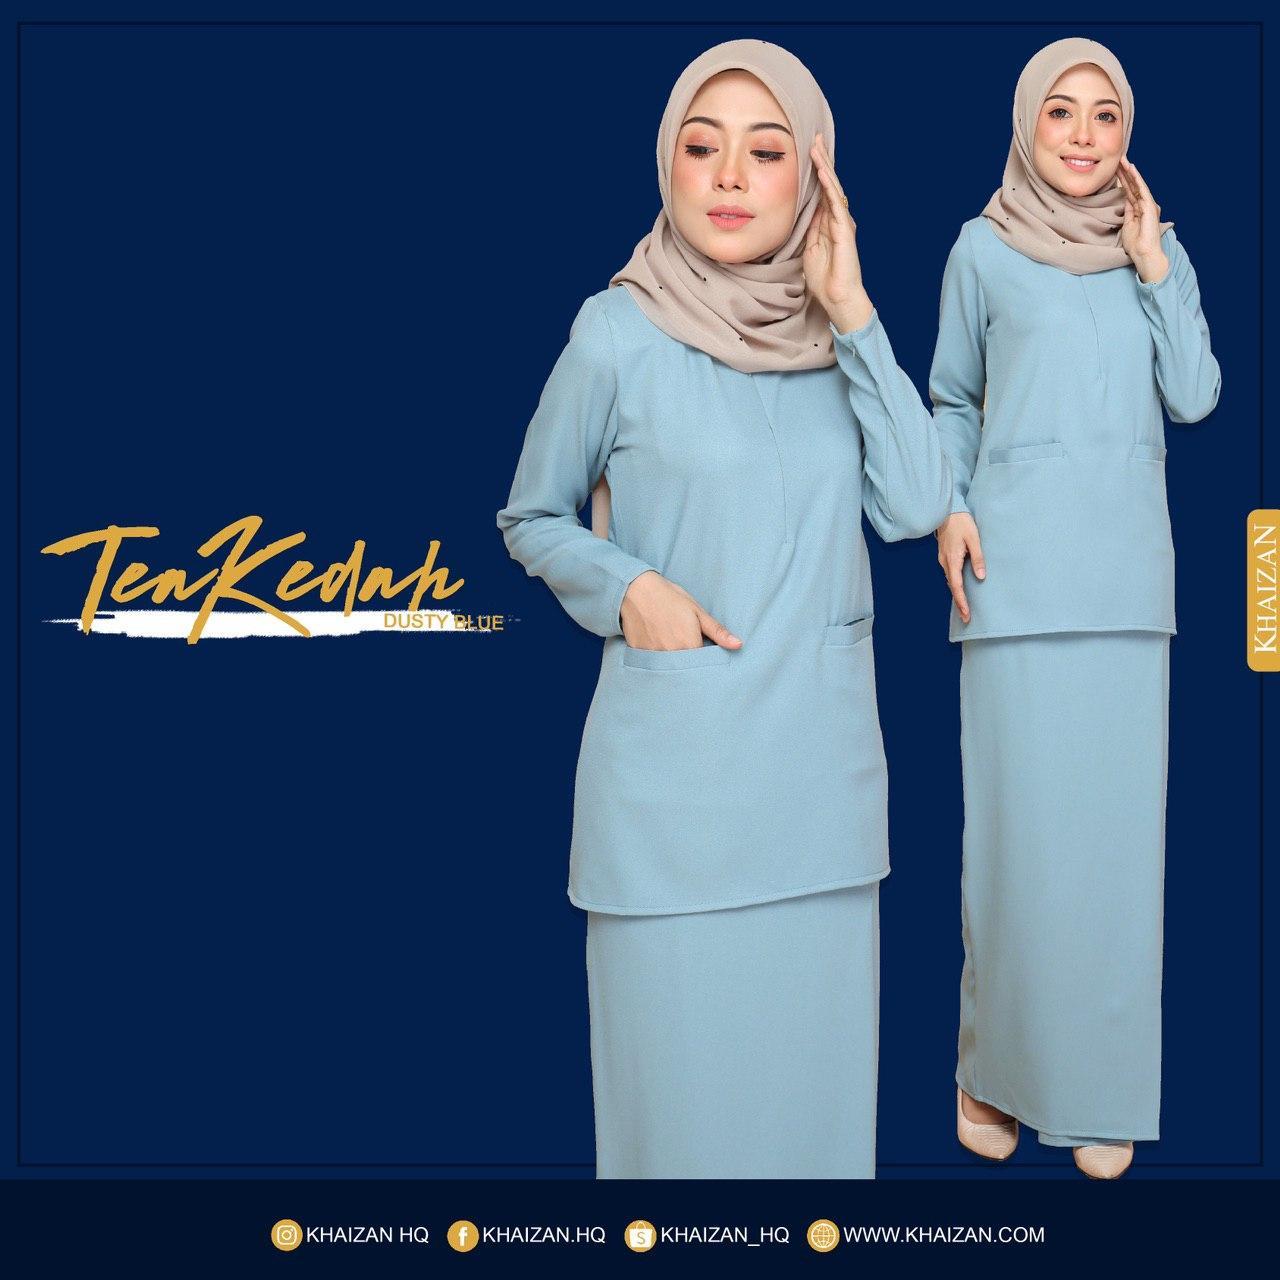 TEA KEDAH - DUSTY BLUE